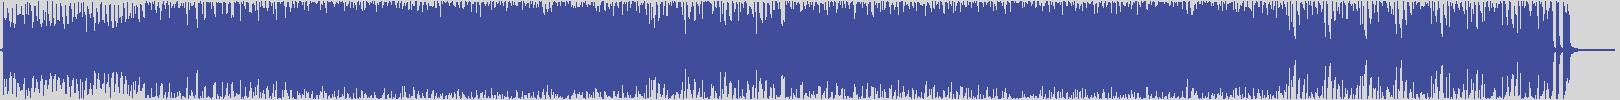 3effe_records [3FR001] Danny Metal - 90 Gradi [Original Version] audio wave form